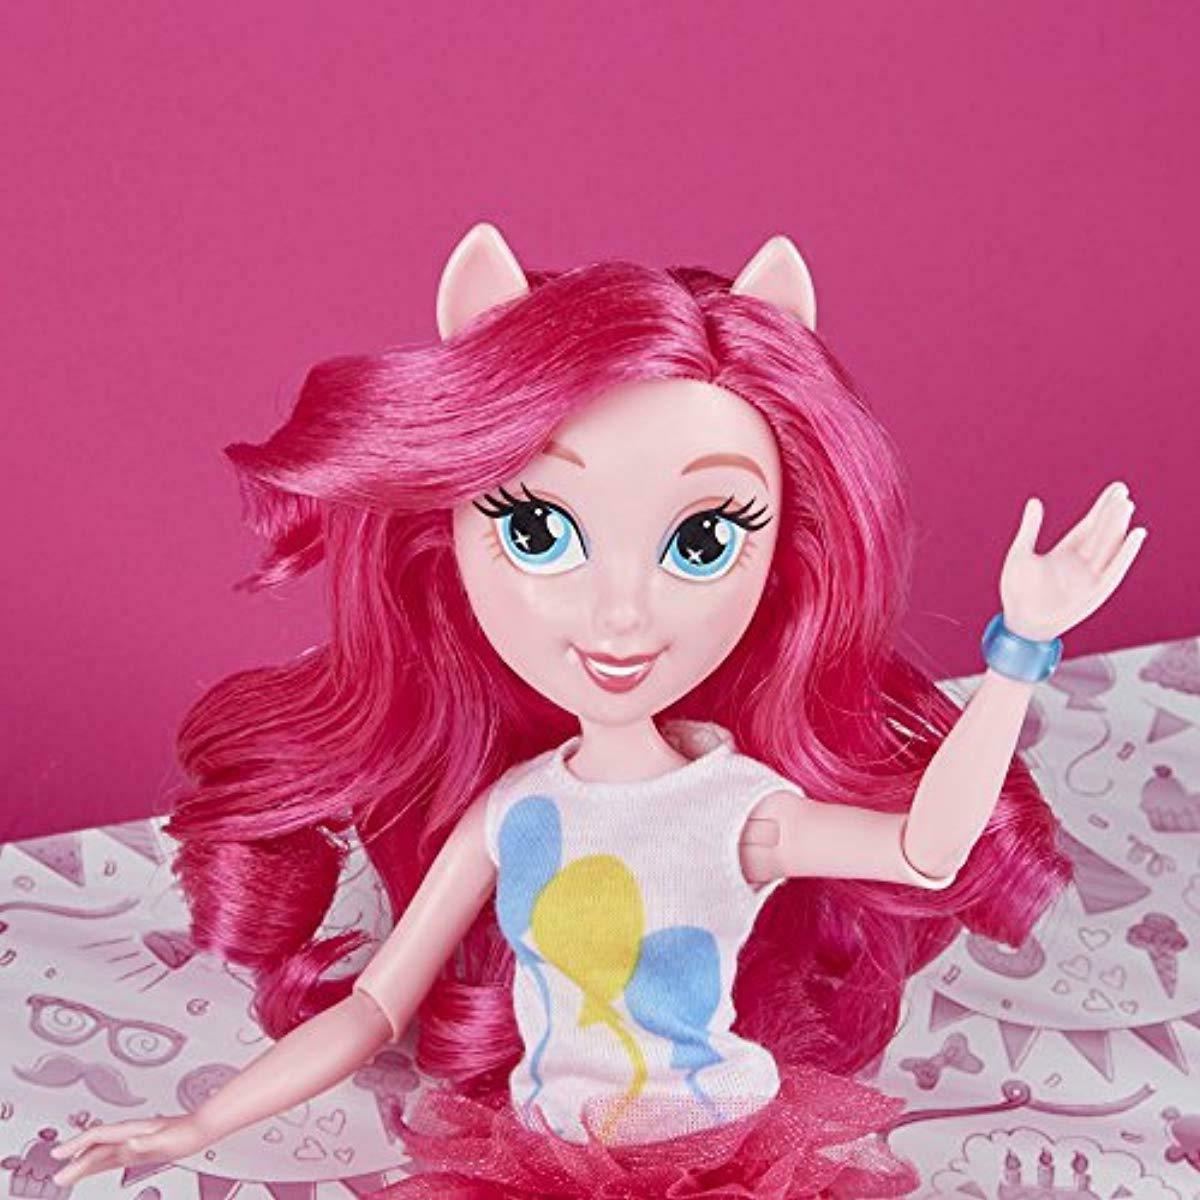 My Pony Equestria Girls Style Play Toy